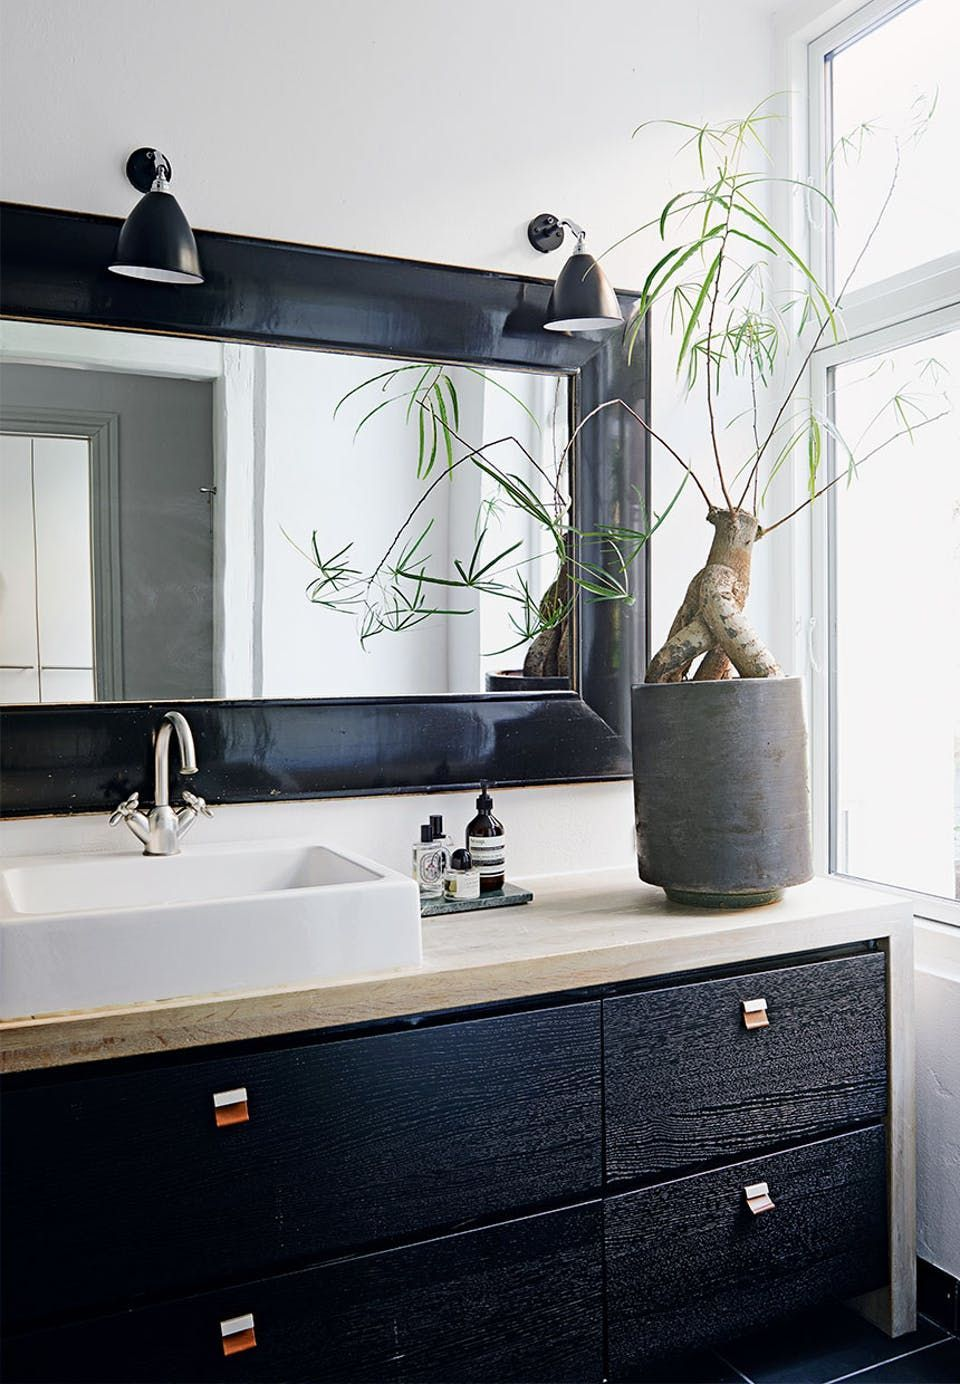 Elegant bathroom furniture with a minimalistic sink and a